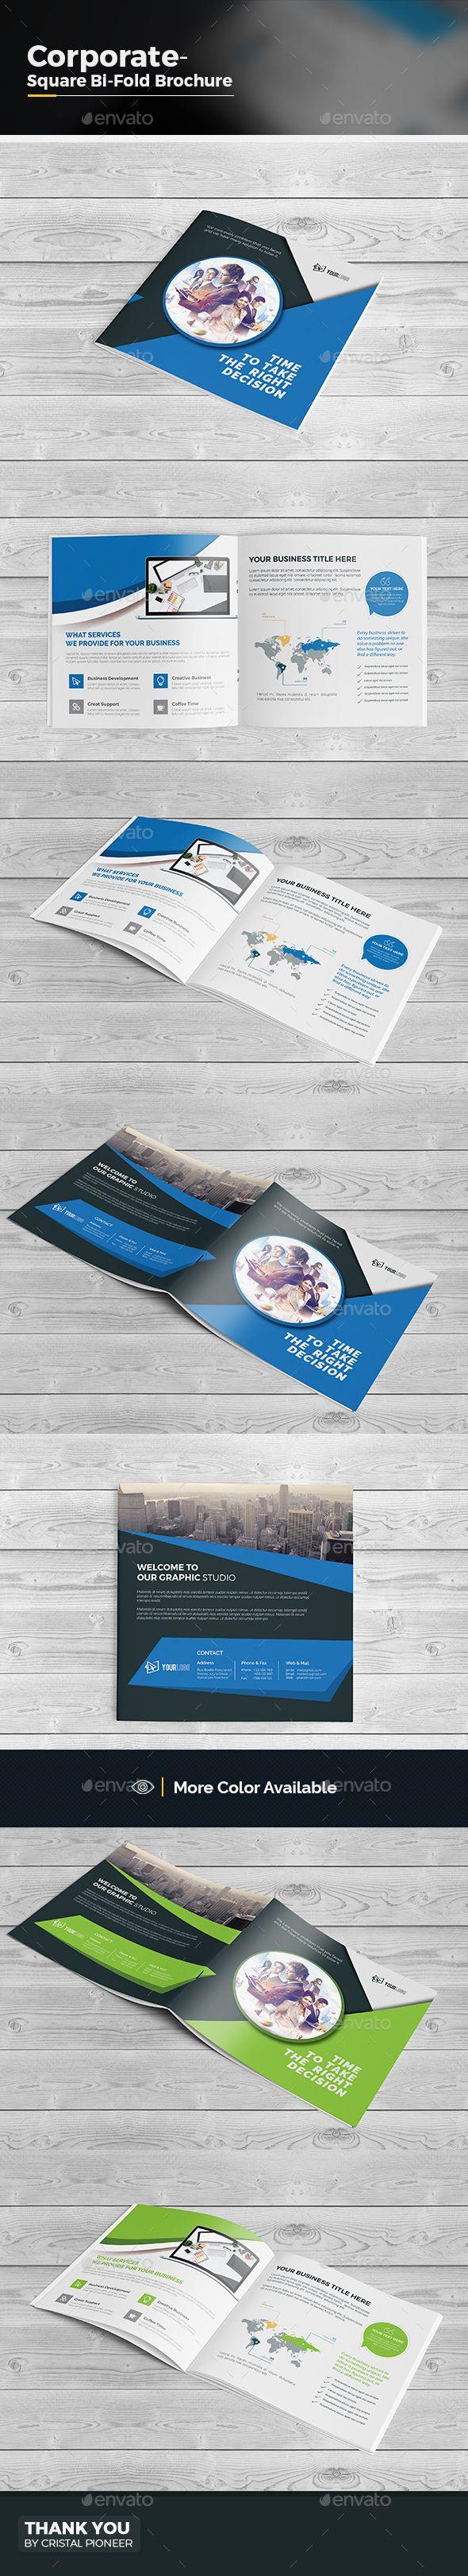 Square Bi Fold Brochure Template Vector EPS, AI Illustrator